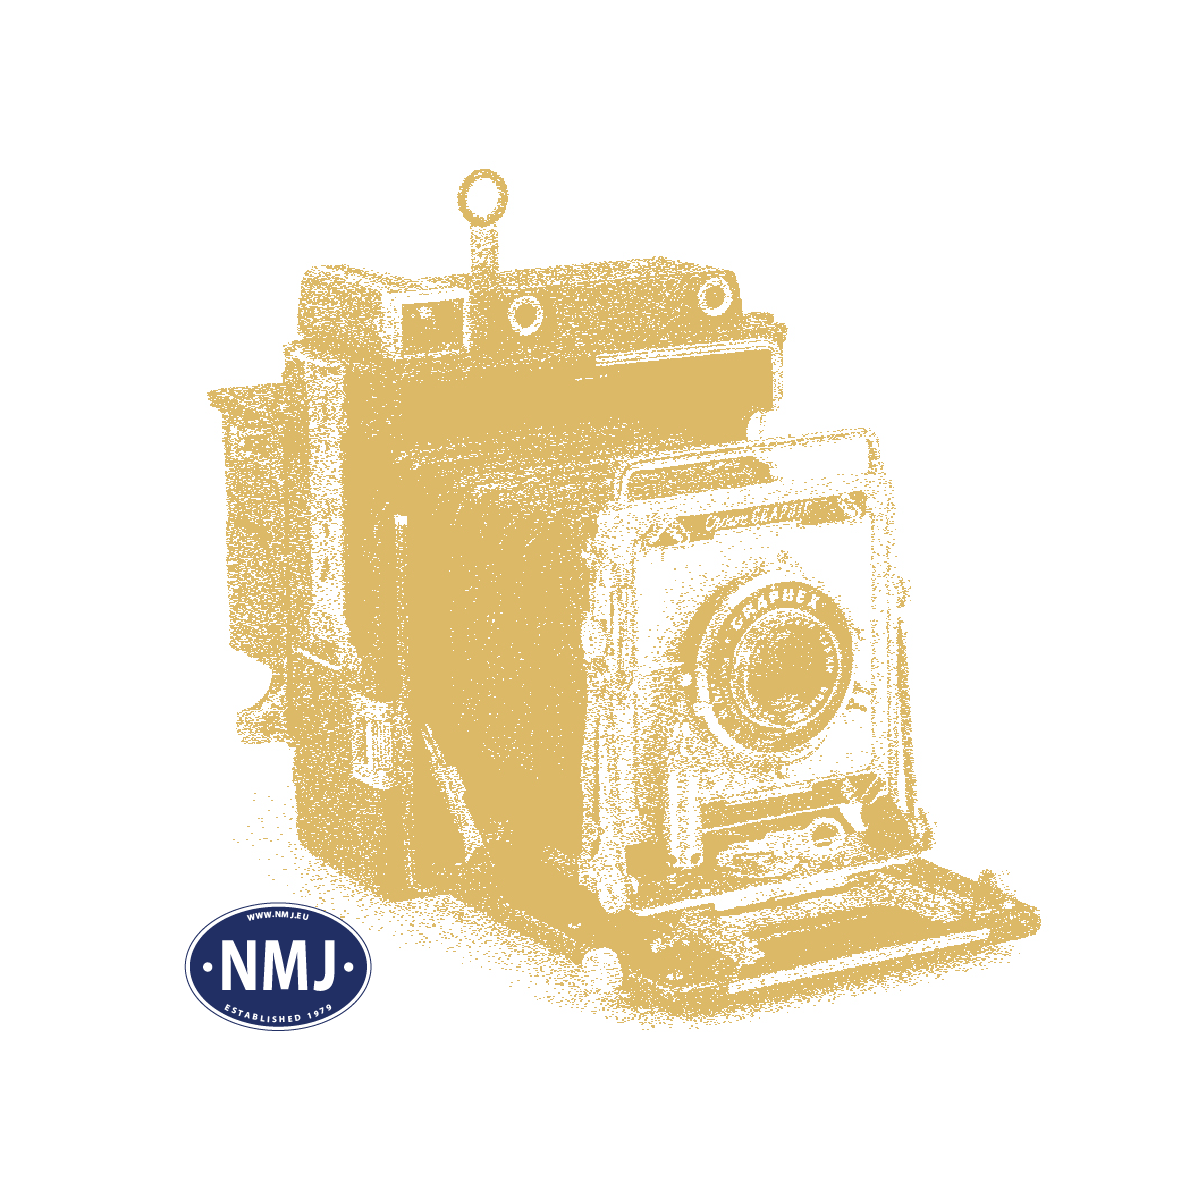 NMJT80.103AC - NMJ Topline NSB EL17.2223, AC, Rotbraun